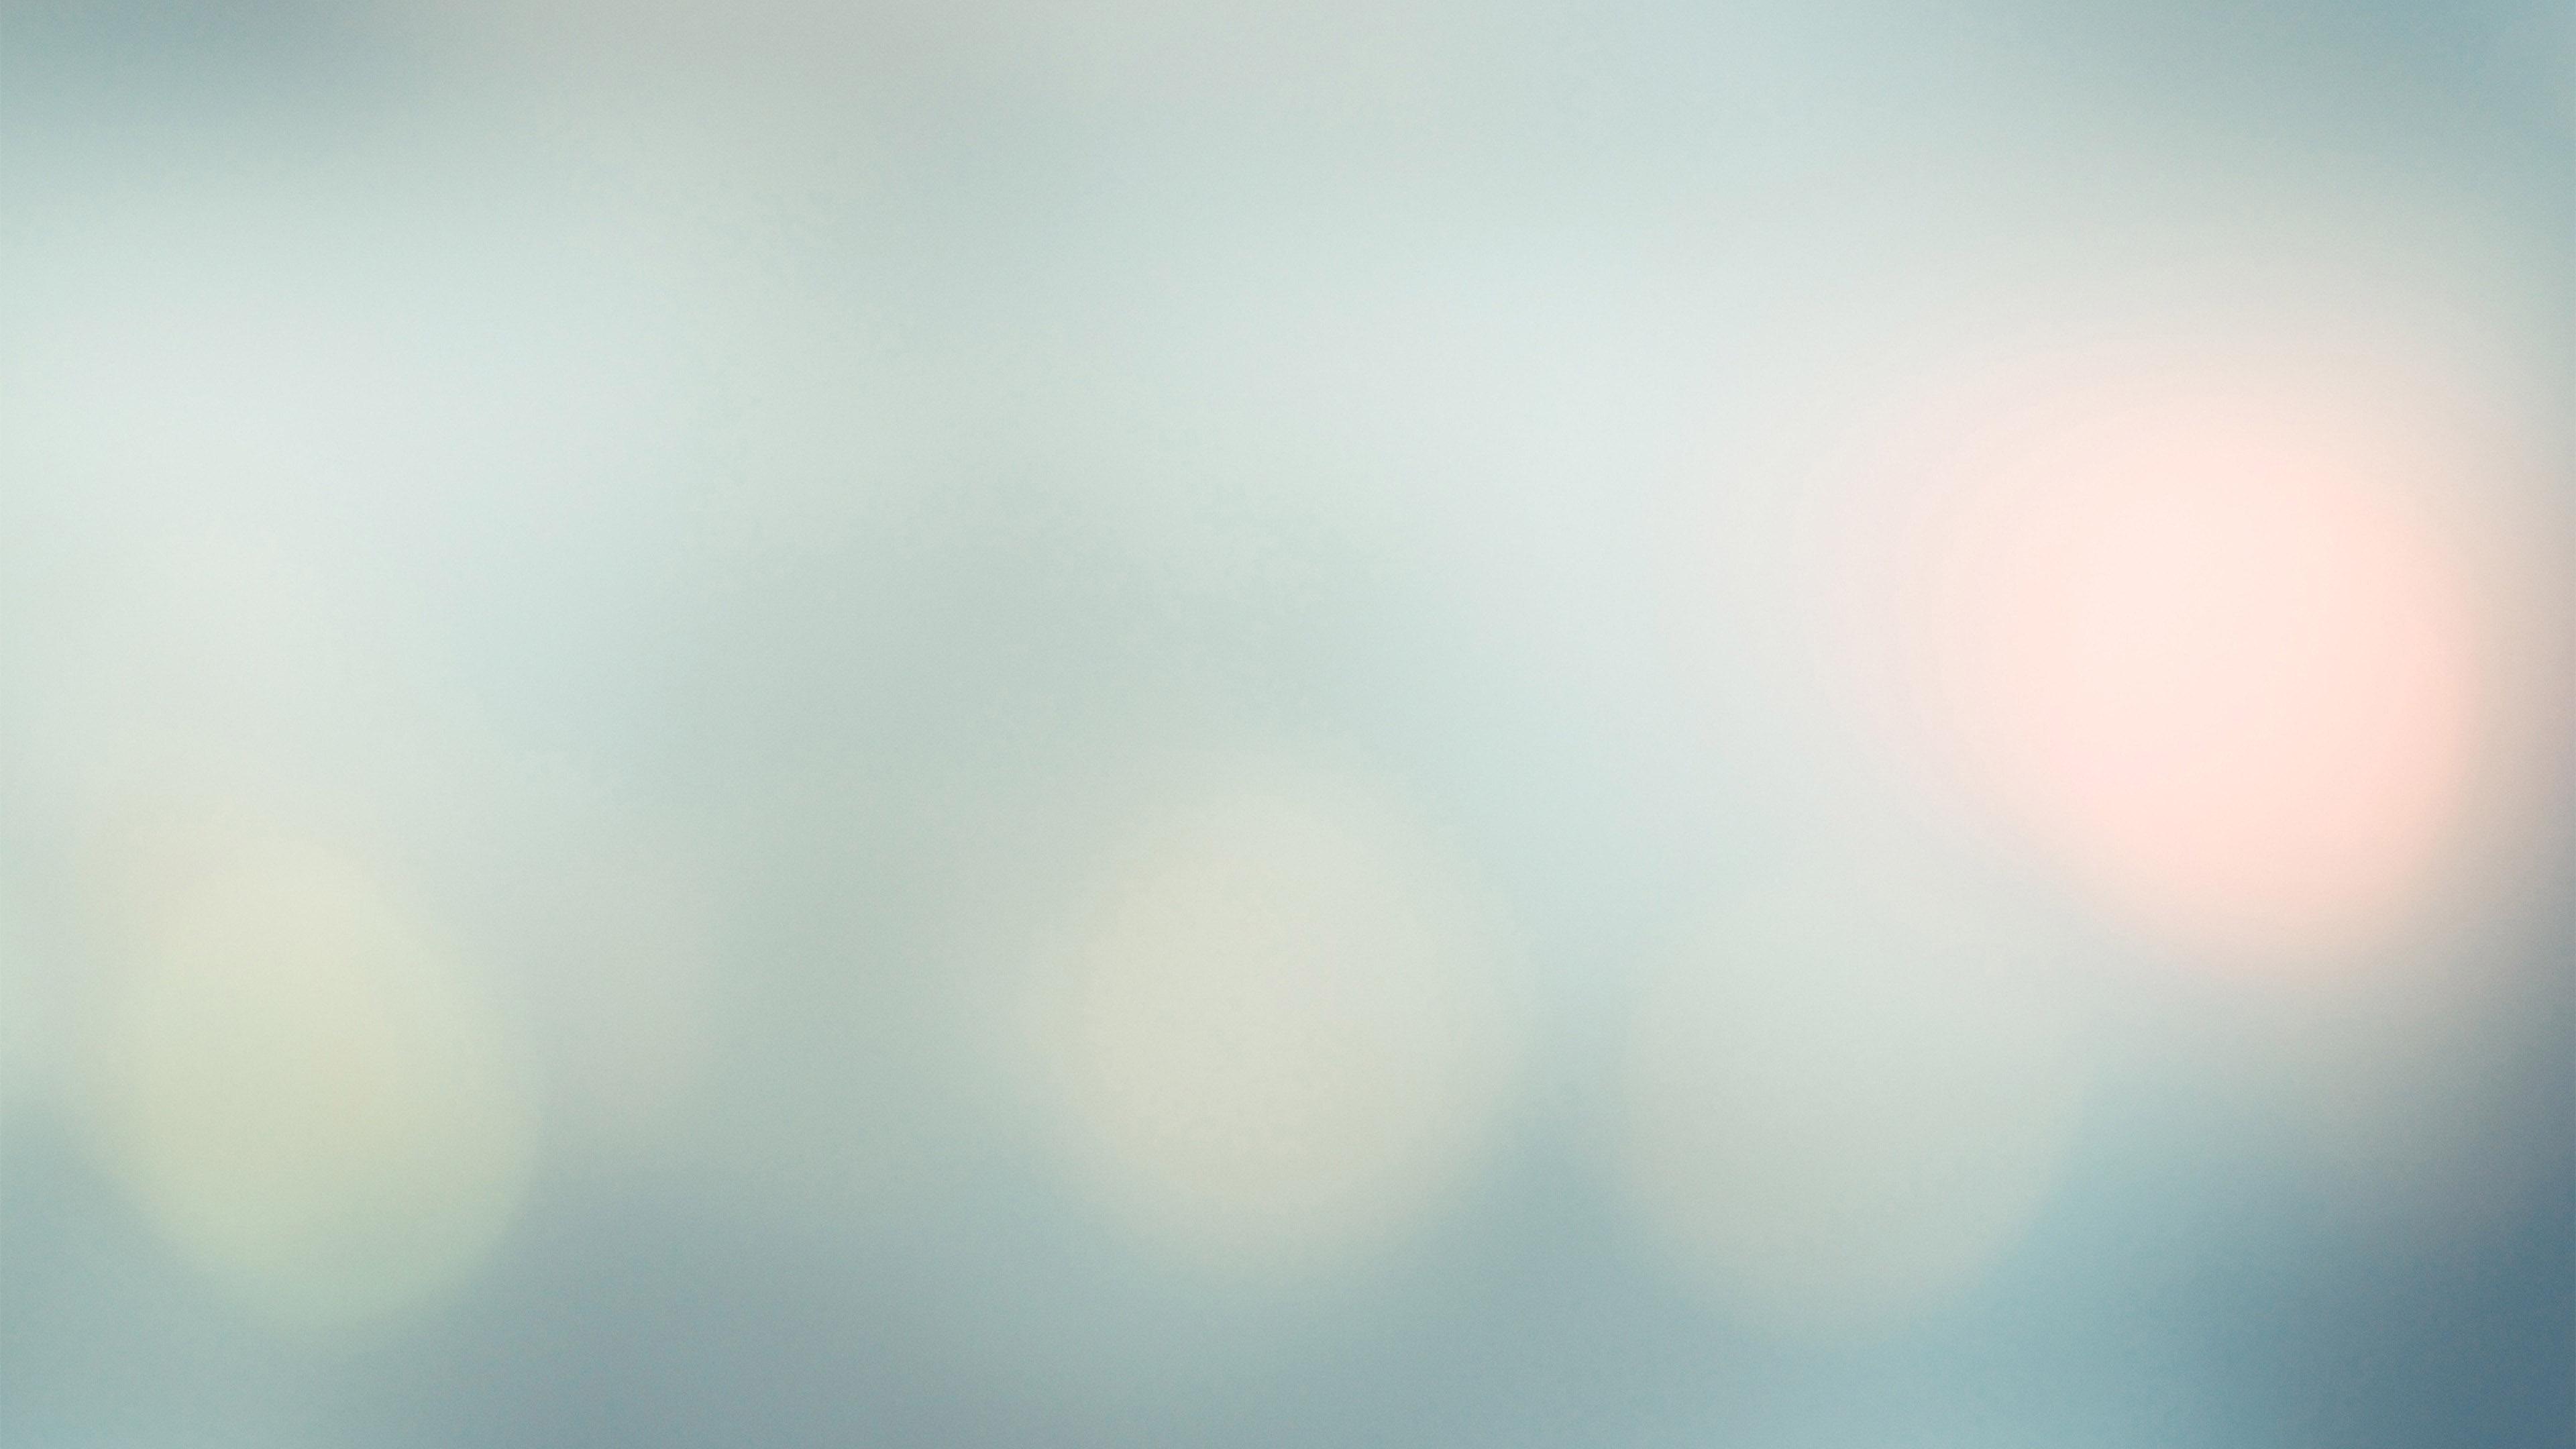 Silver-Blur-Background-Wallpaper